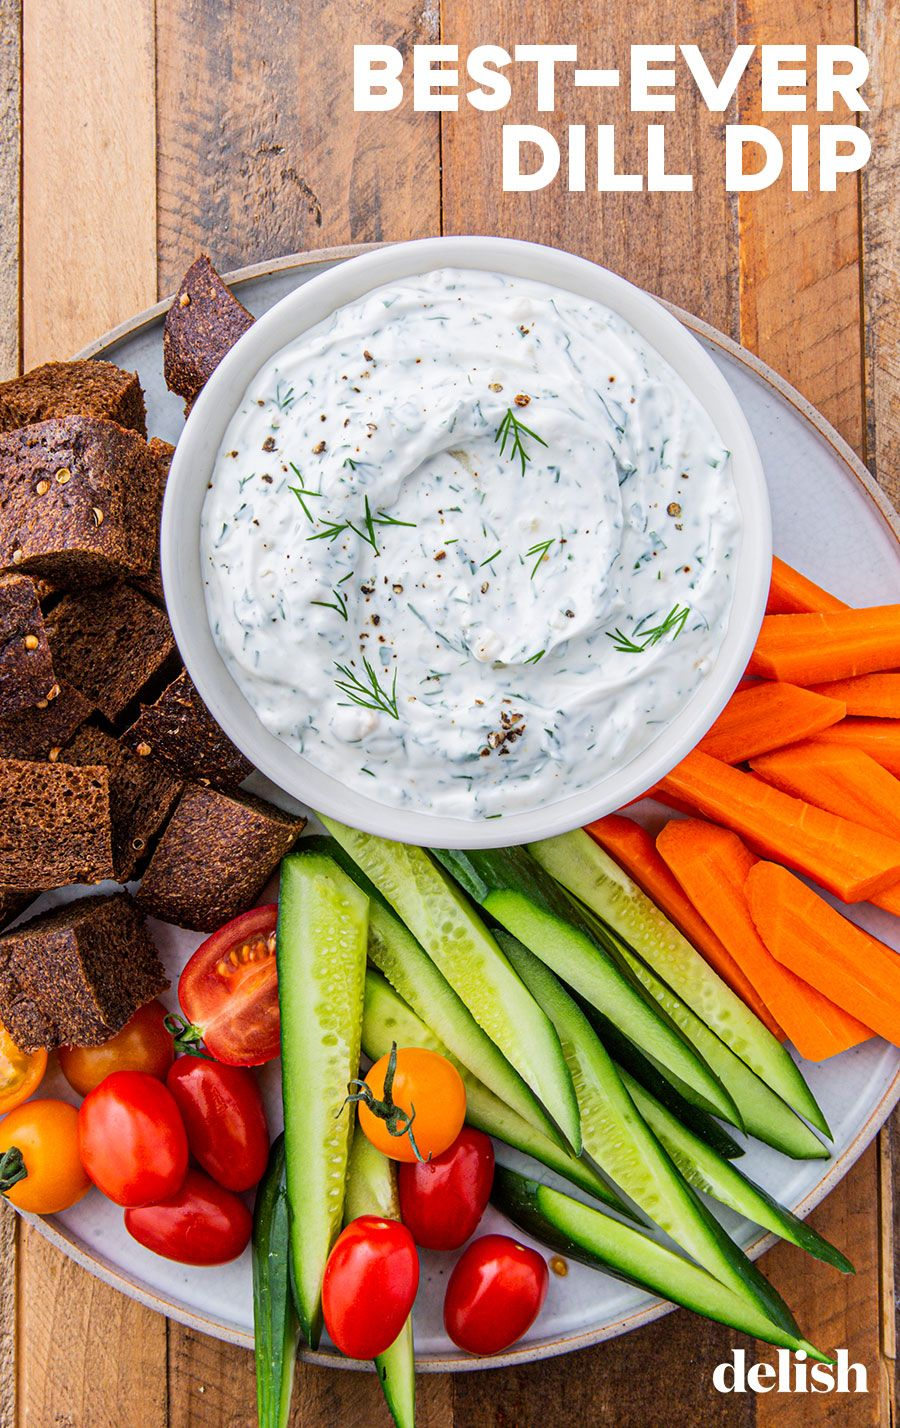 This Dill Dip Makes Us Actually Crave Veggies Recipe Healthy Veggie Dip Dill Recipes Dill Dip